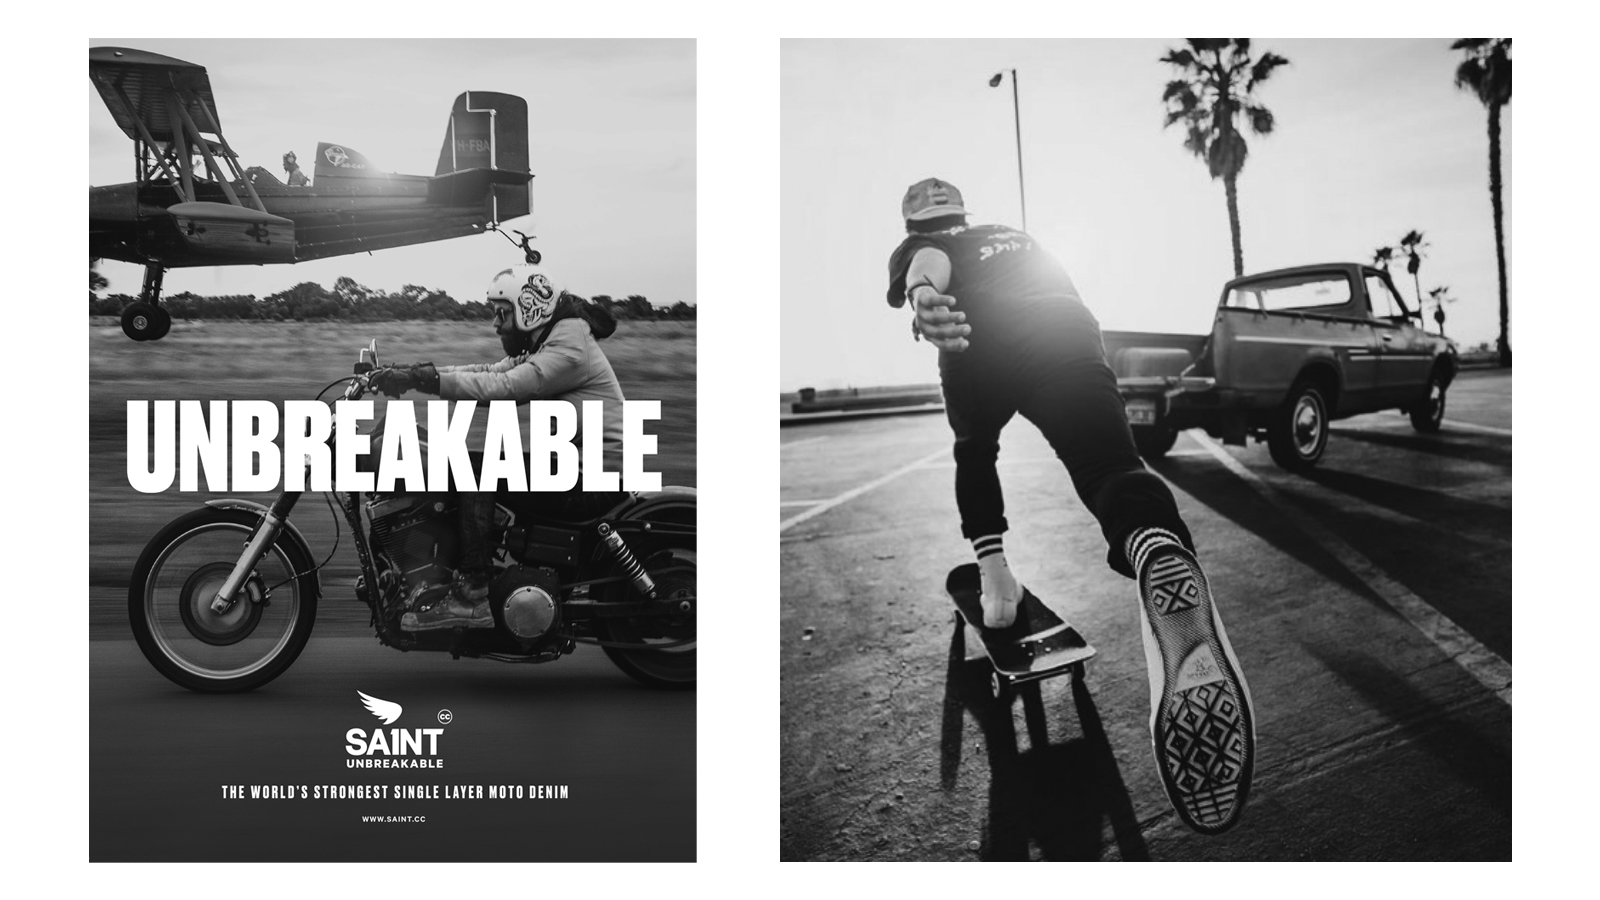 SA1NT Unbreakable